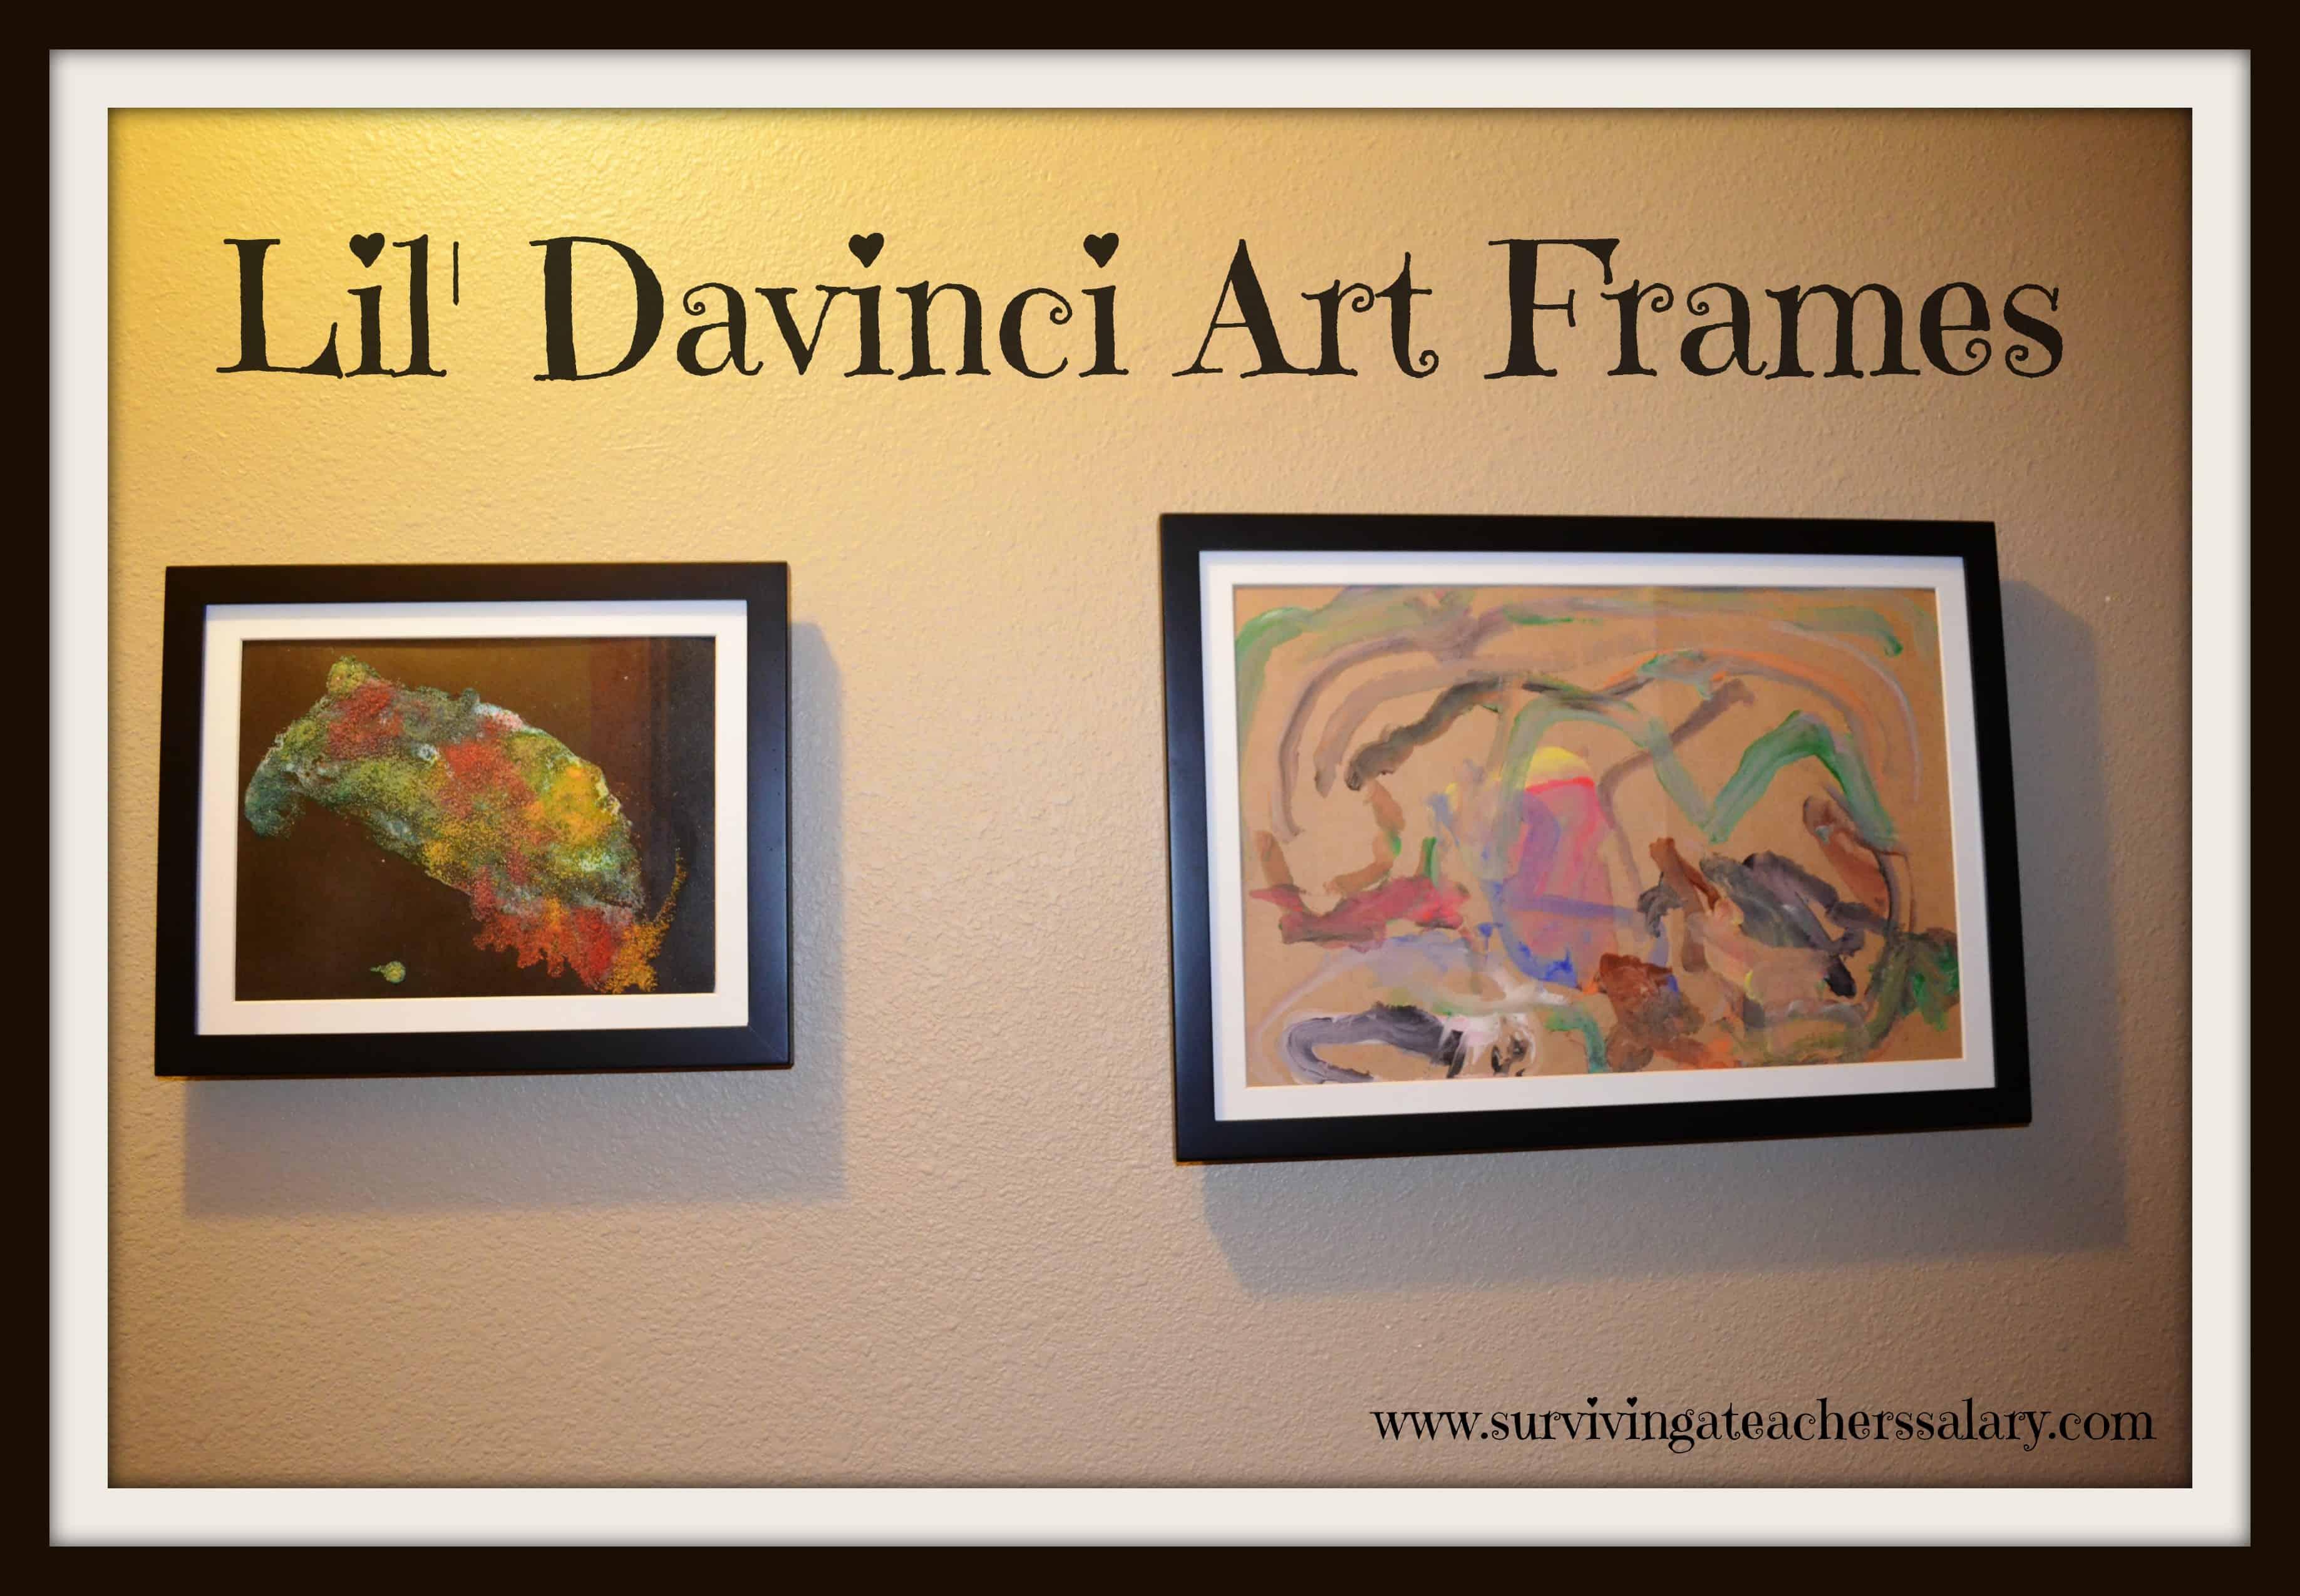 Lil Davinci Art Frames 2